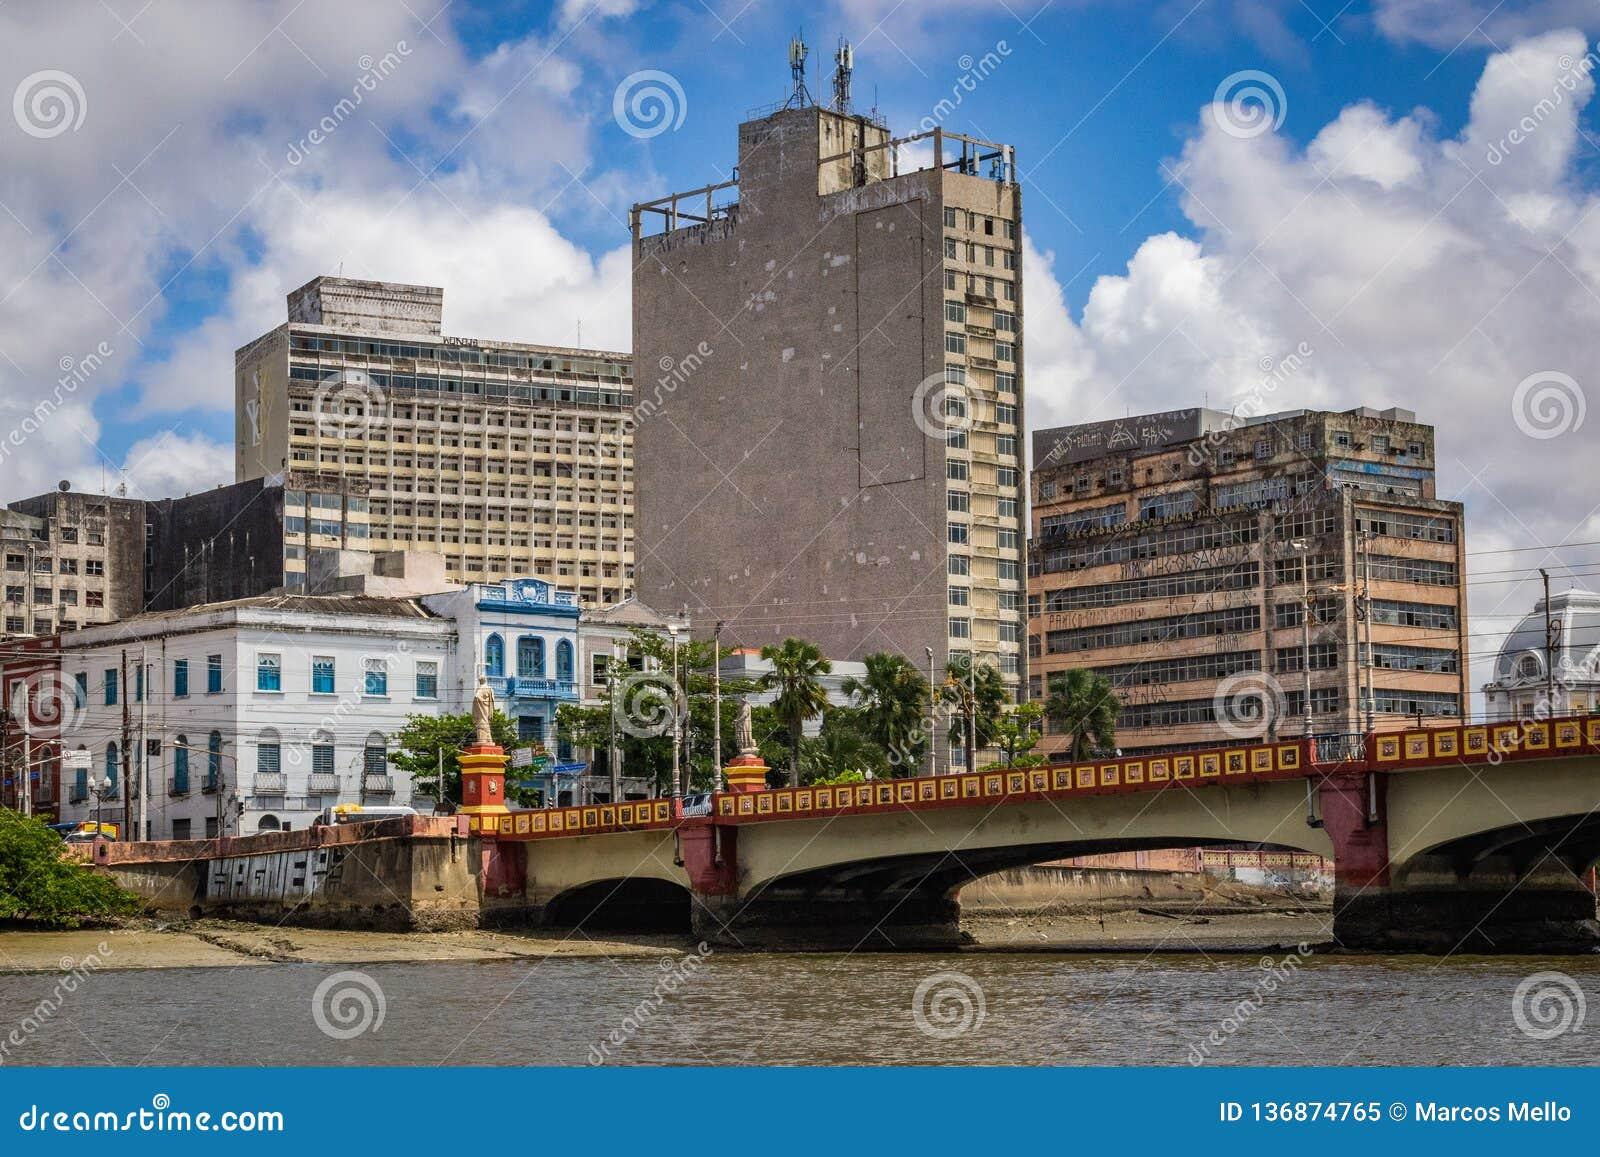 Cities of Brazil - Recife, Pernambuco state`s capital